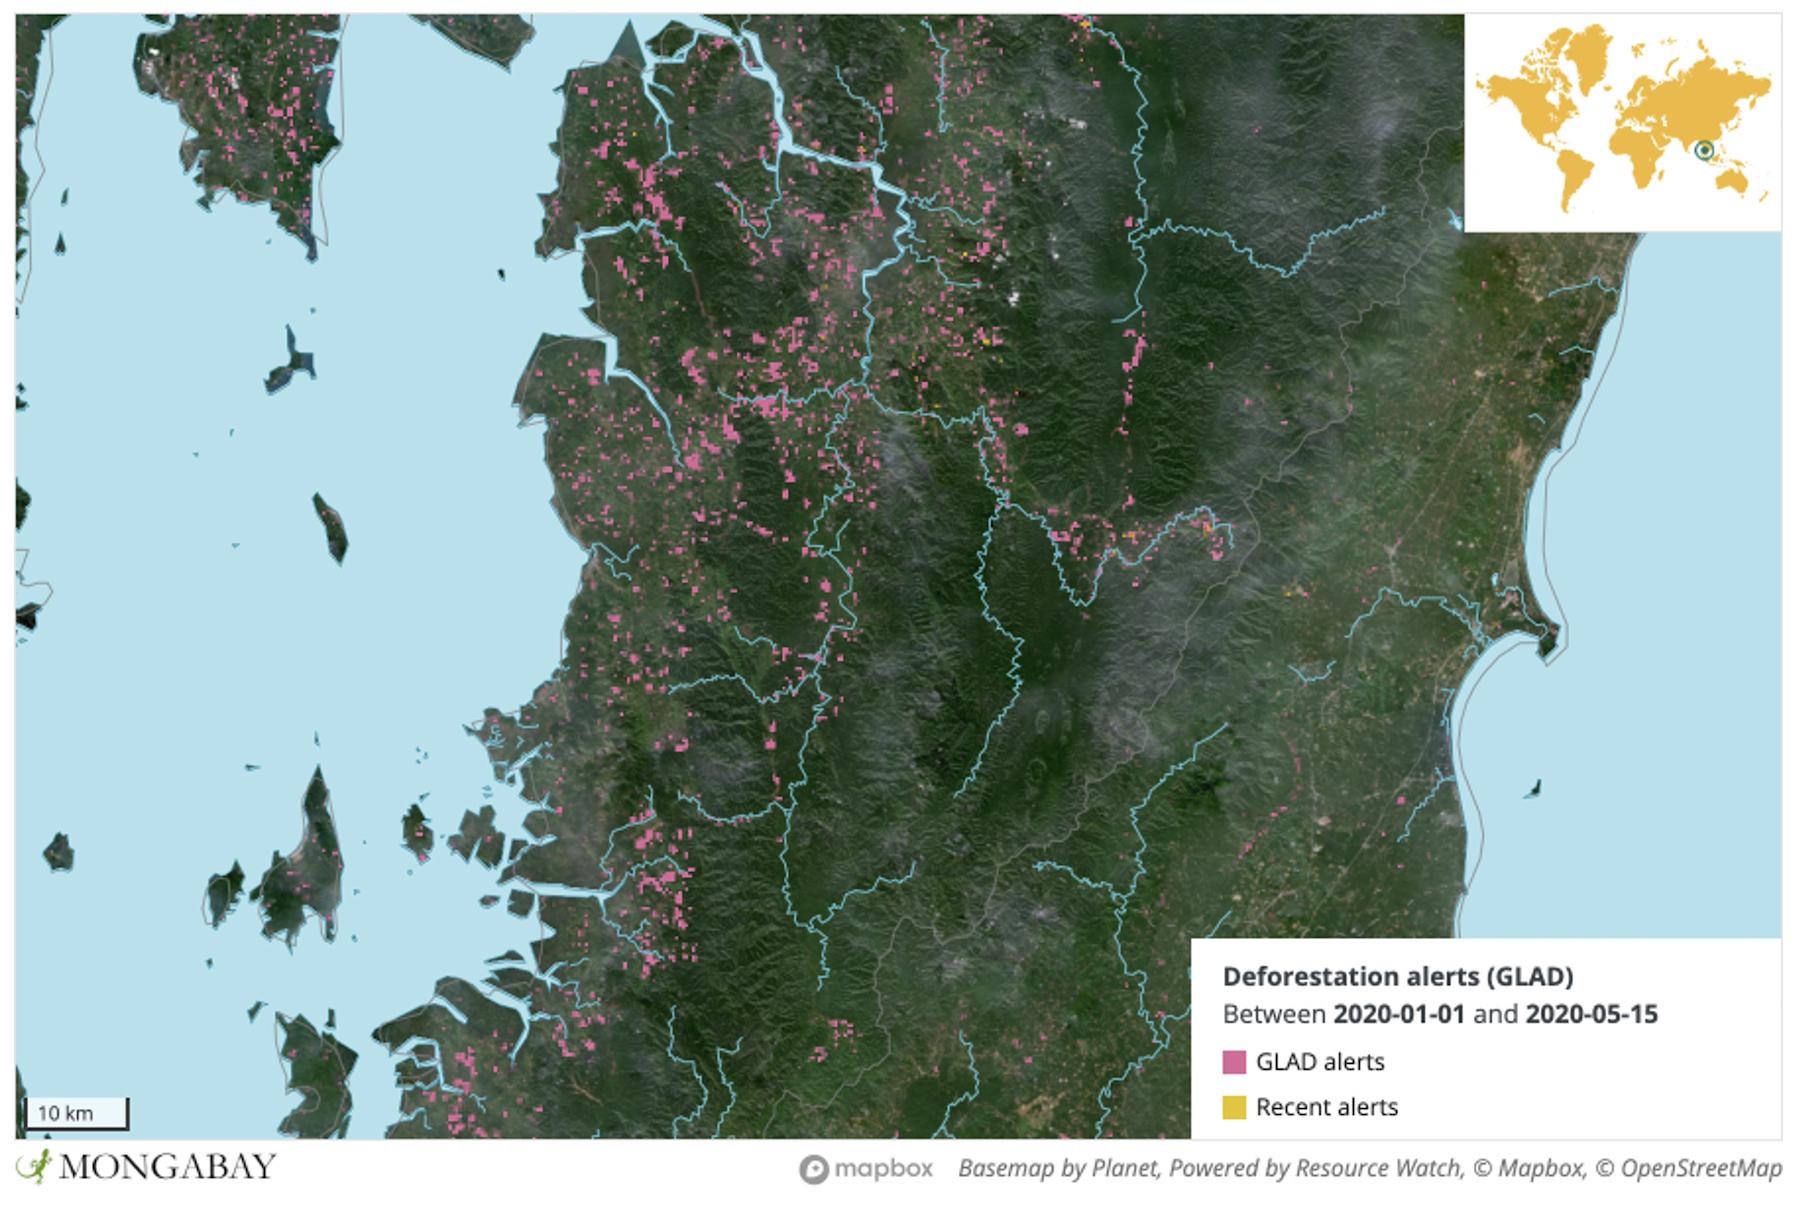 UMD satellite data show high levels of deforestation activity in Kawthoung, Myanmar.